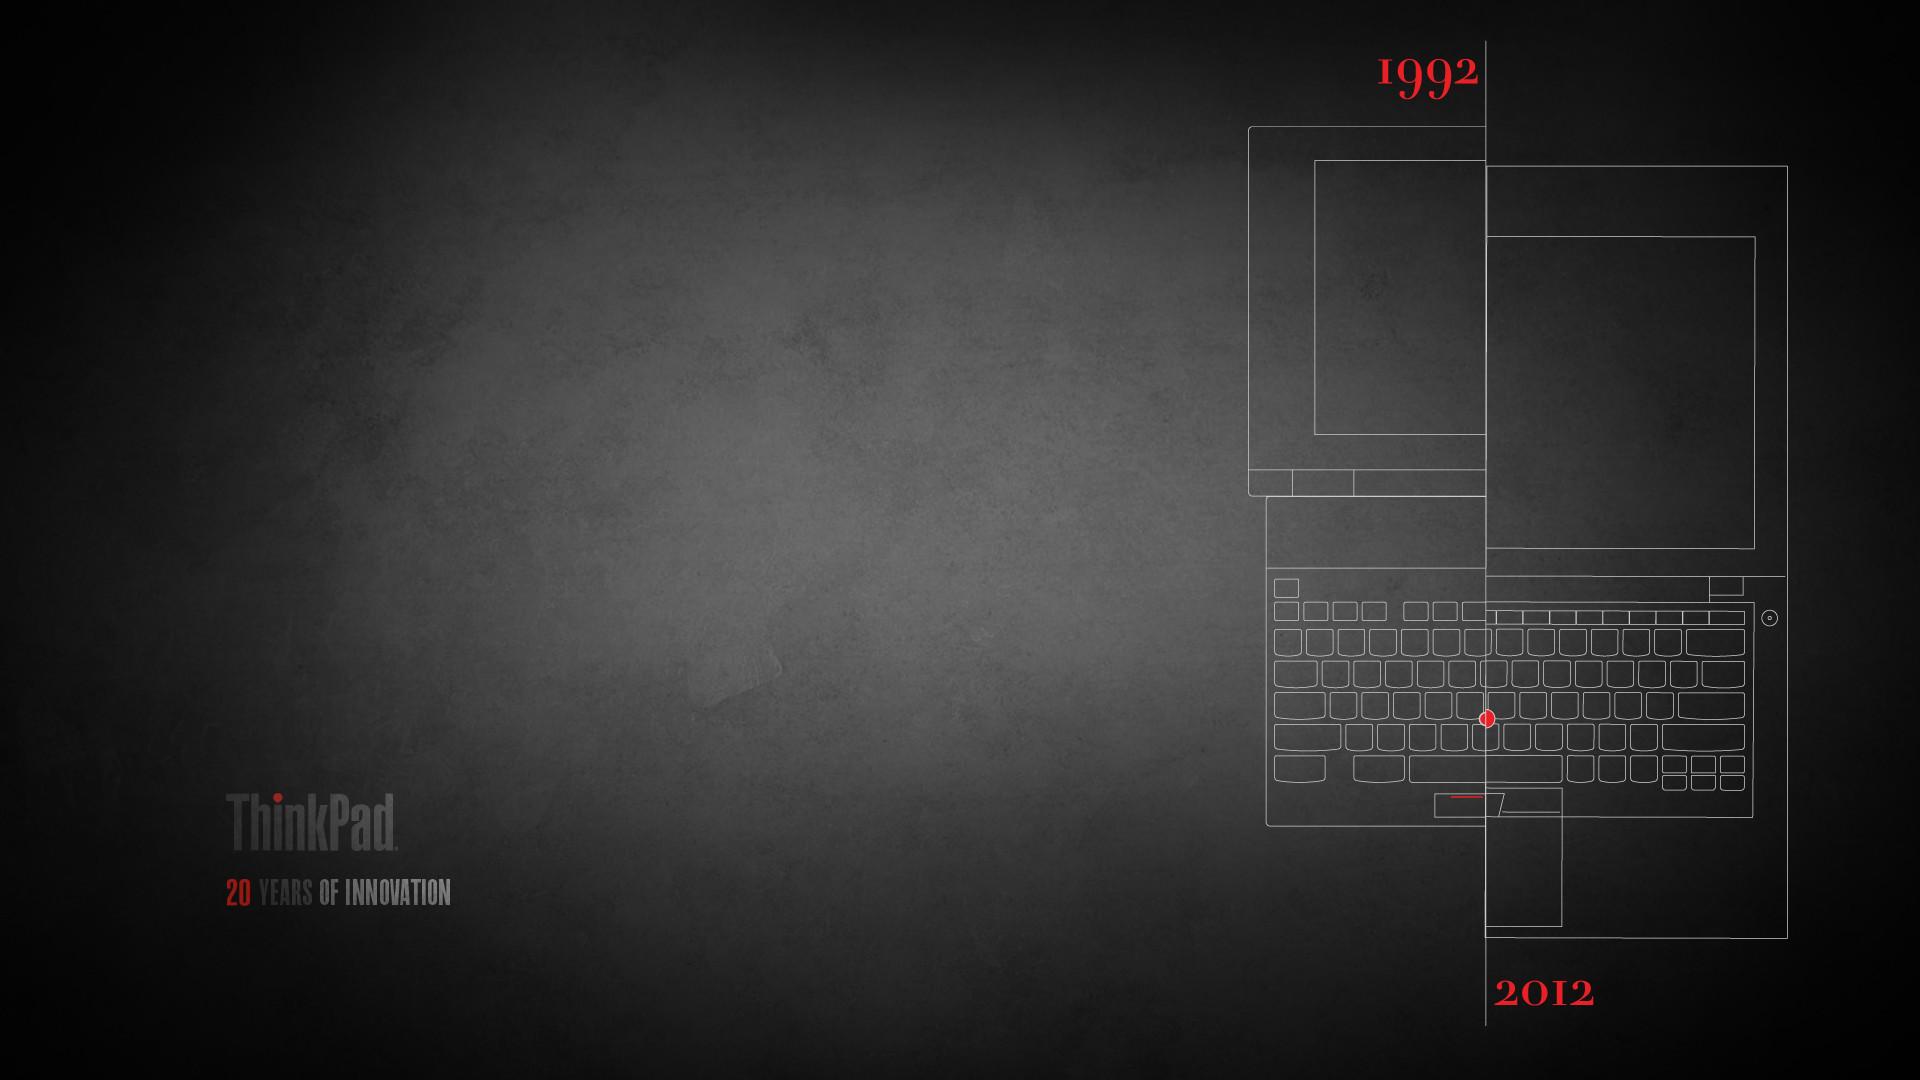 lenovo thinkpad wallpaper 67 images